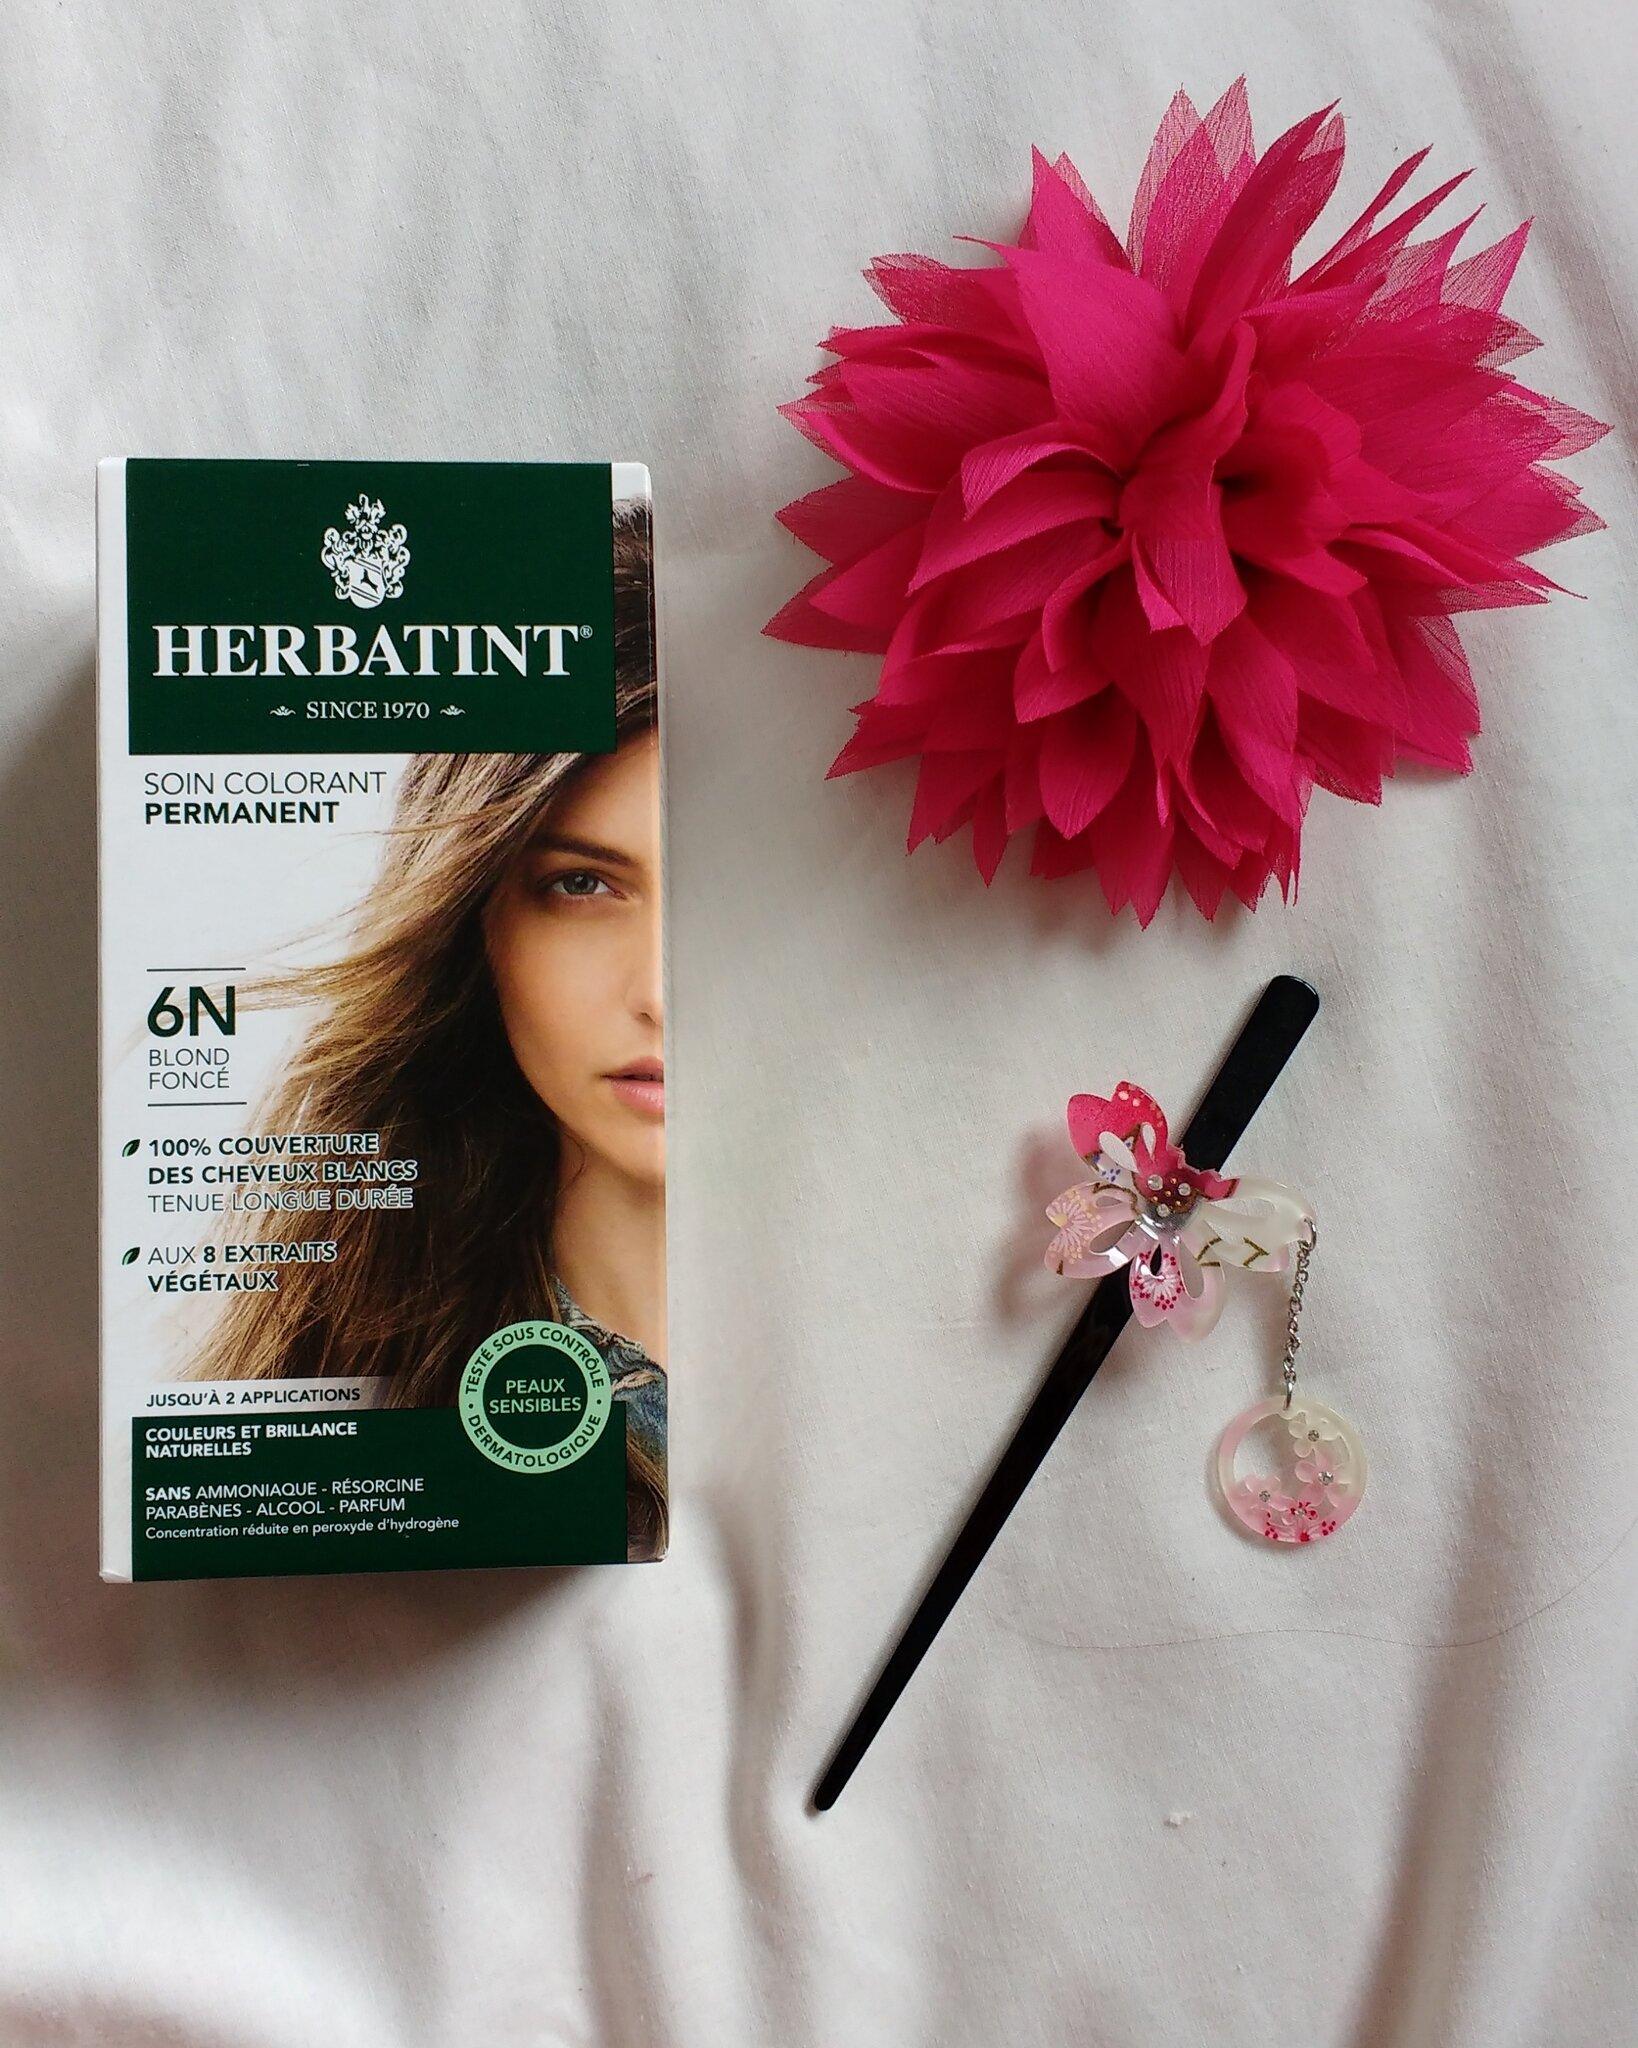 img_20160530_174408 - Coloration Herbatint